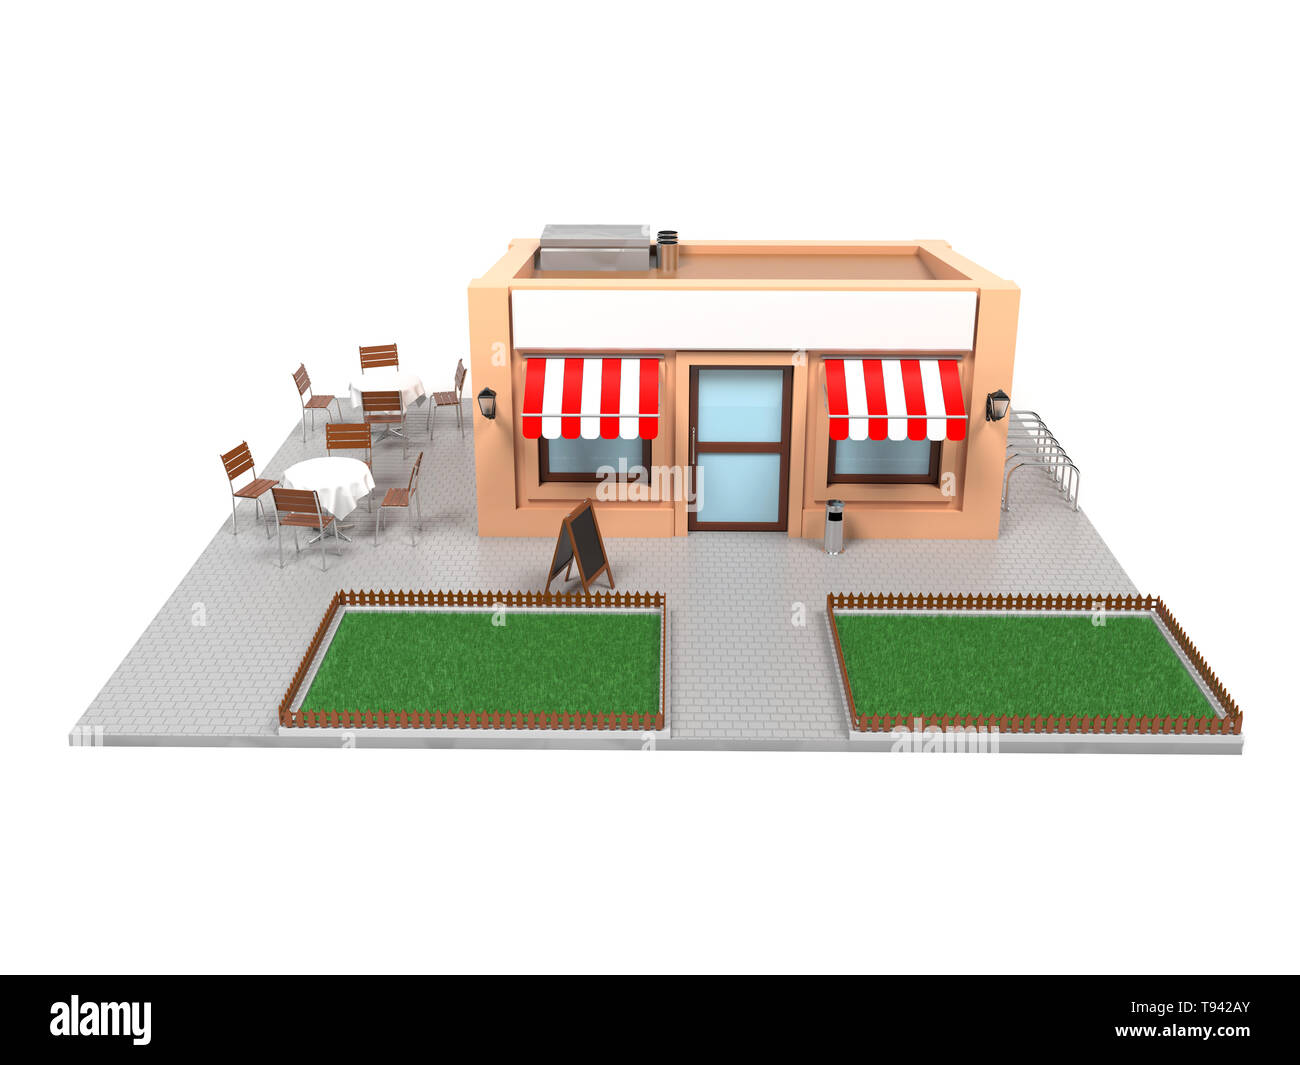 Market store complete exterior design. Urban scene. 3d rendering illustration. - Stock Image